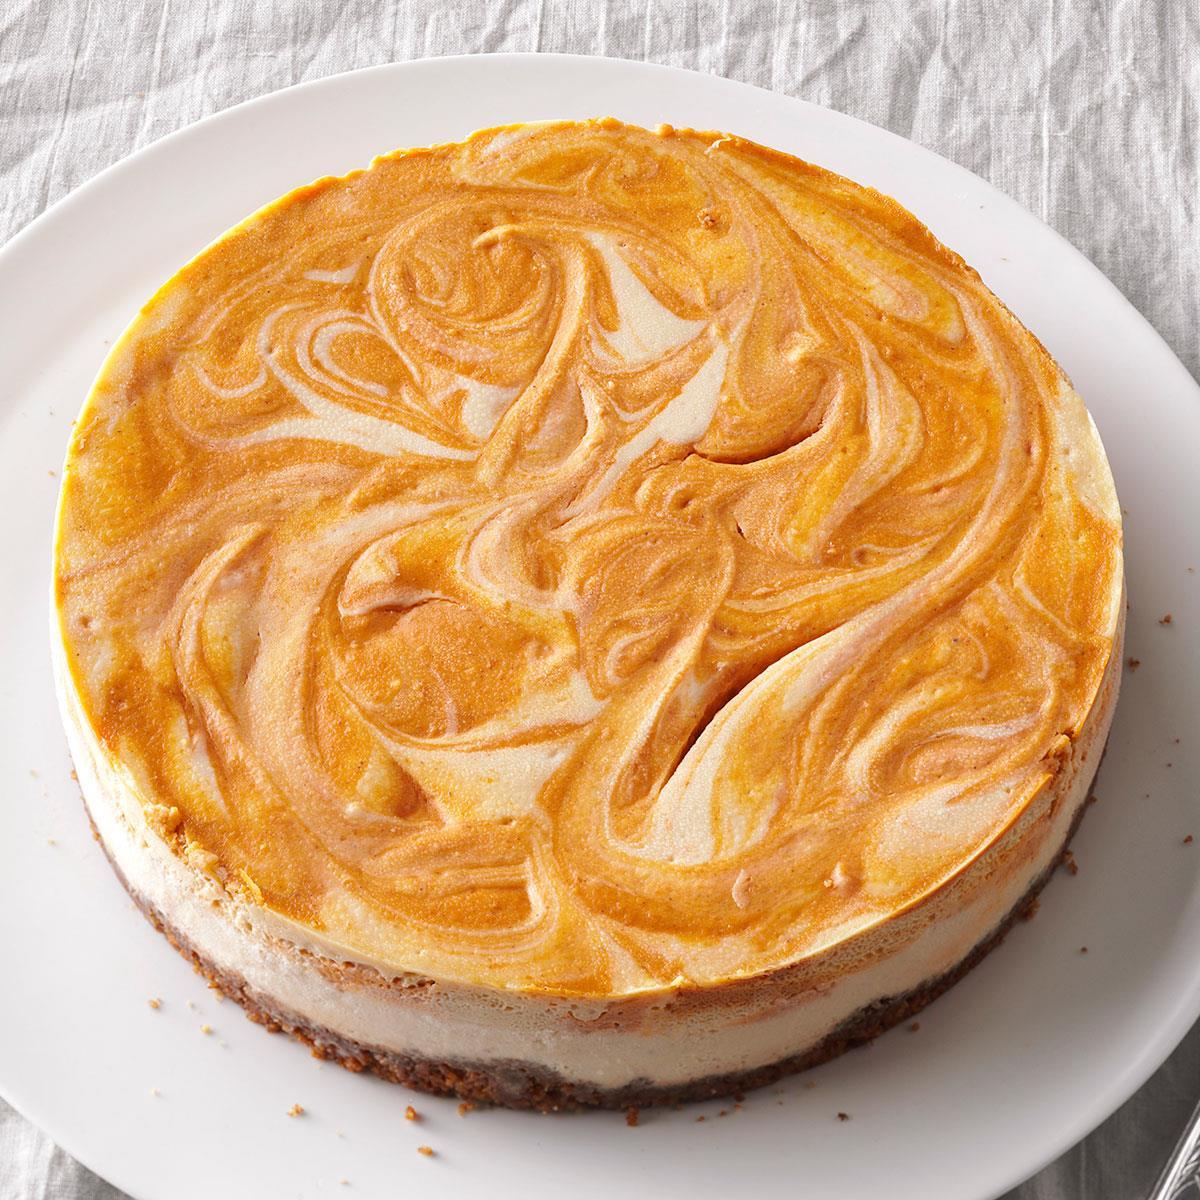 Spiced Pumpkin Swirl Cheesecake Recipe How To Make It Taste Of Home